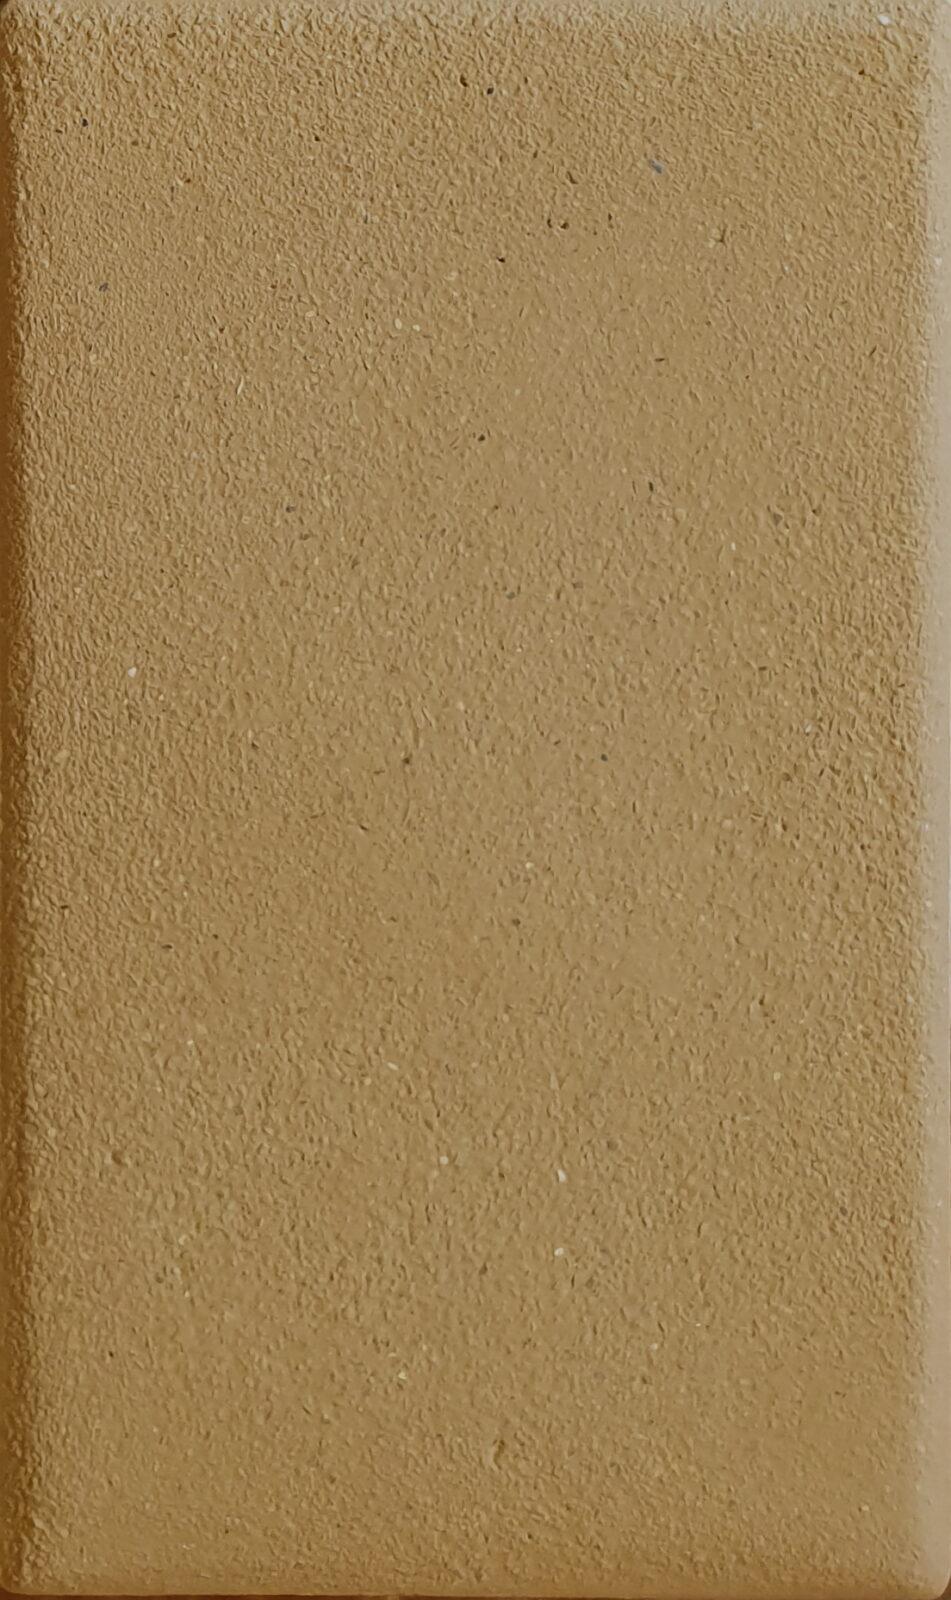 Roman Finish kleurleem leemstuc